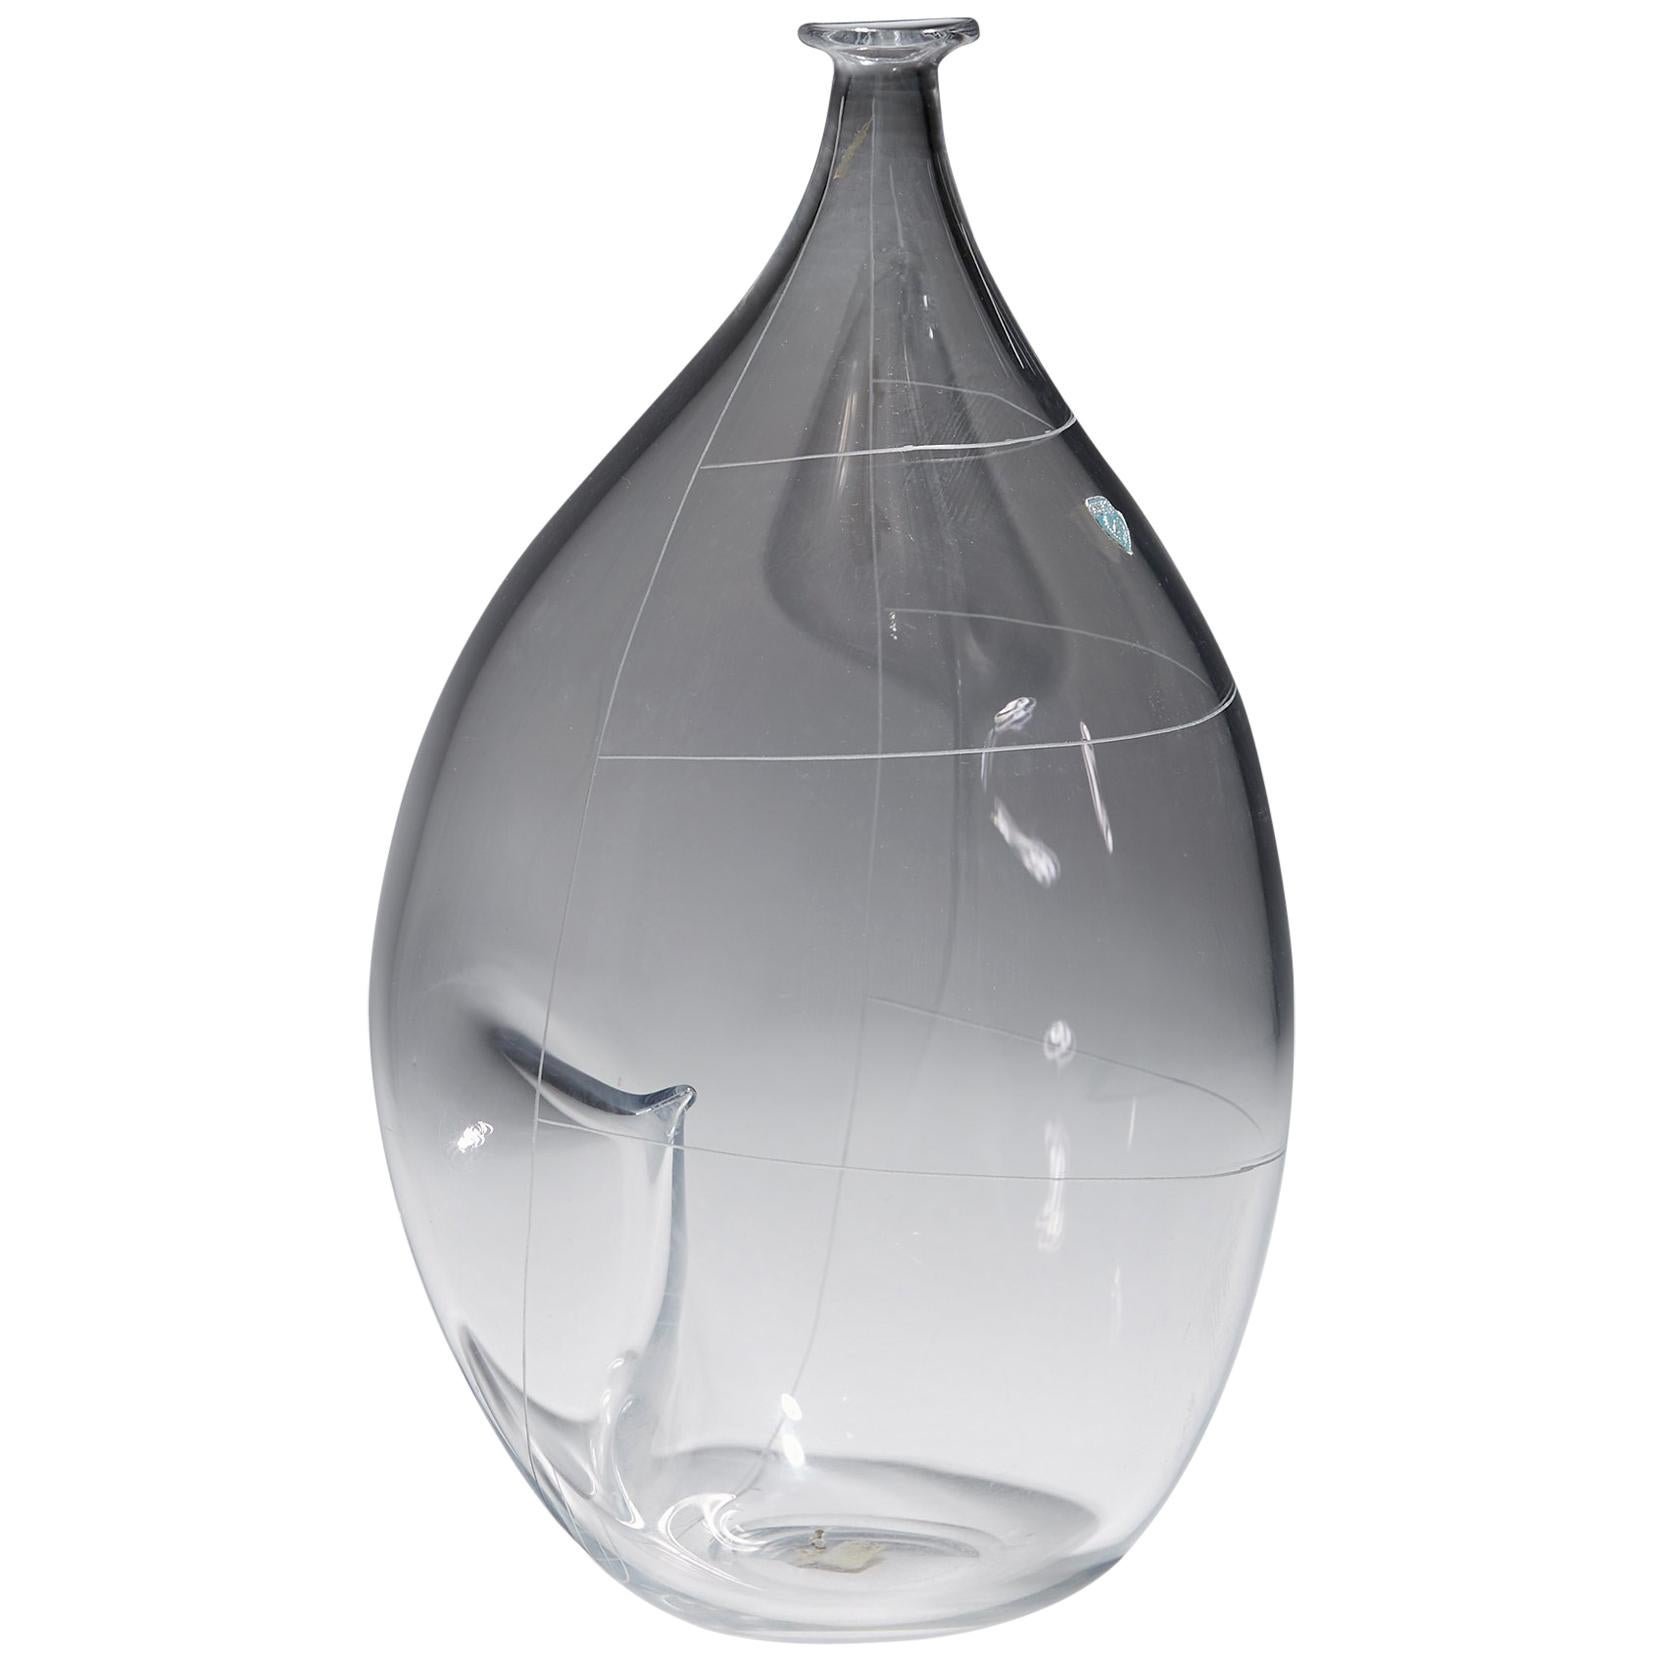 Vase Designed by Ingeborg Lundin for Orrefors, Sweden, 1955